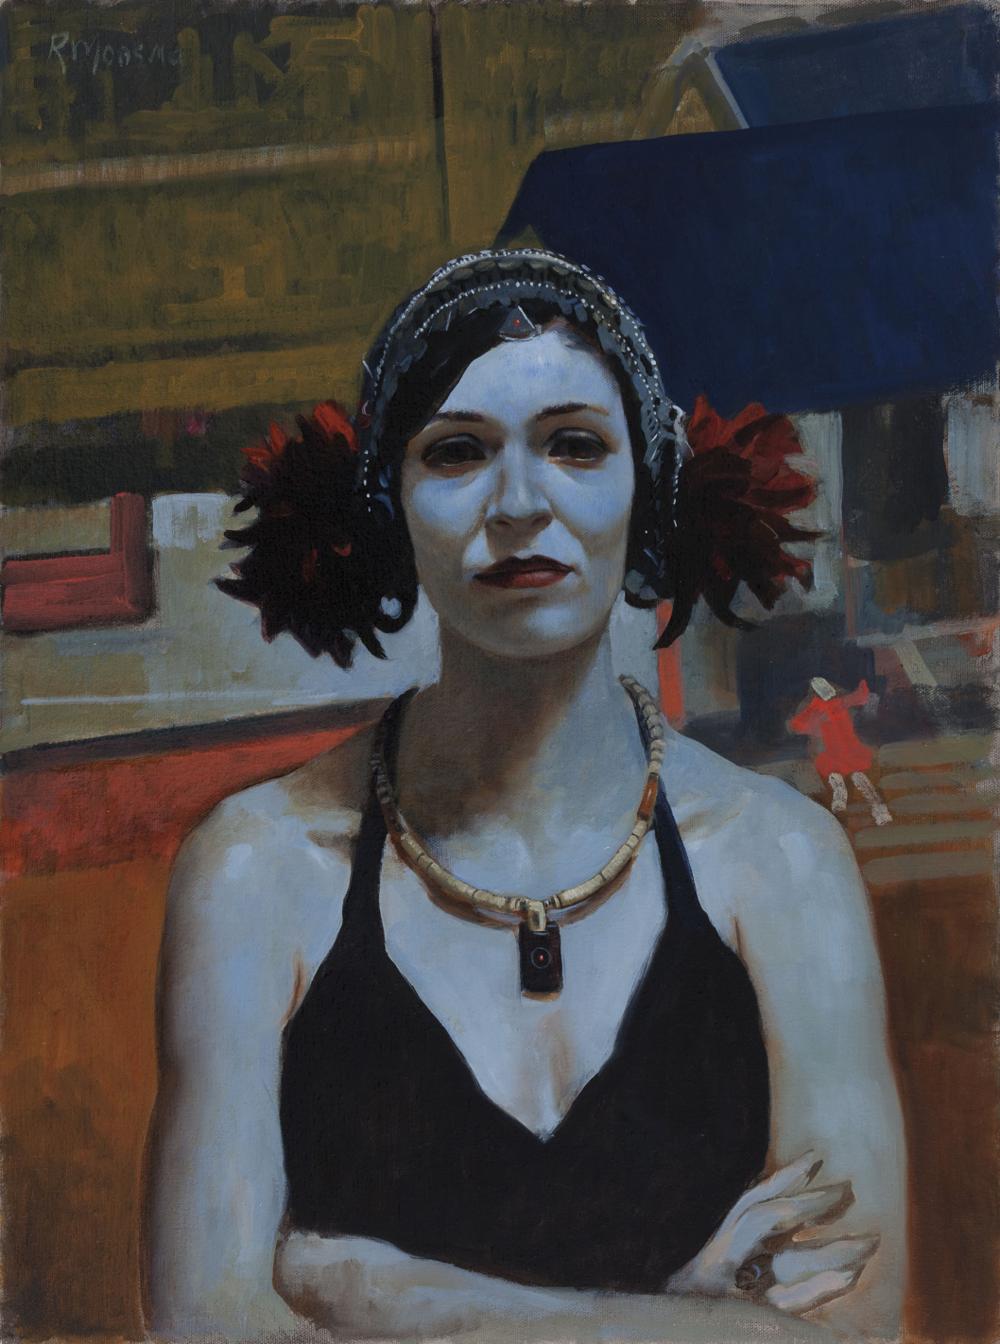 Ron Monsma, Blue Dancer  Oil on Canvas, 24x18 in.